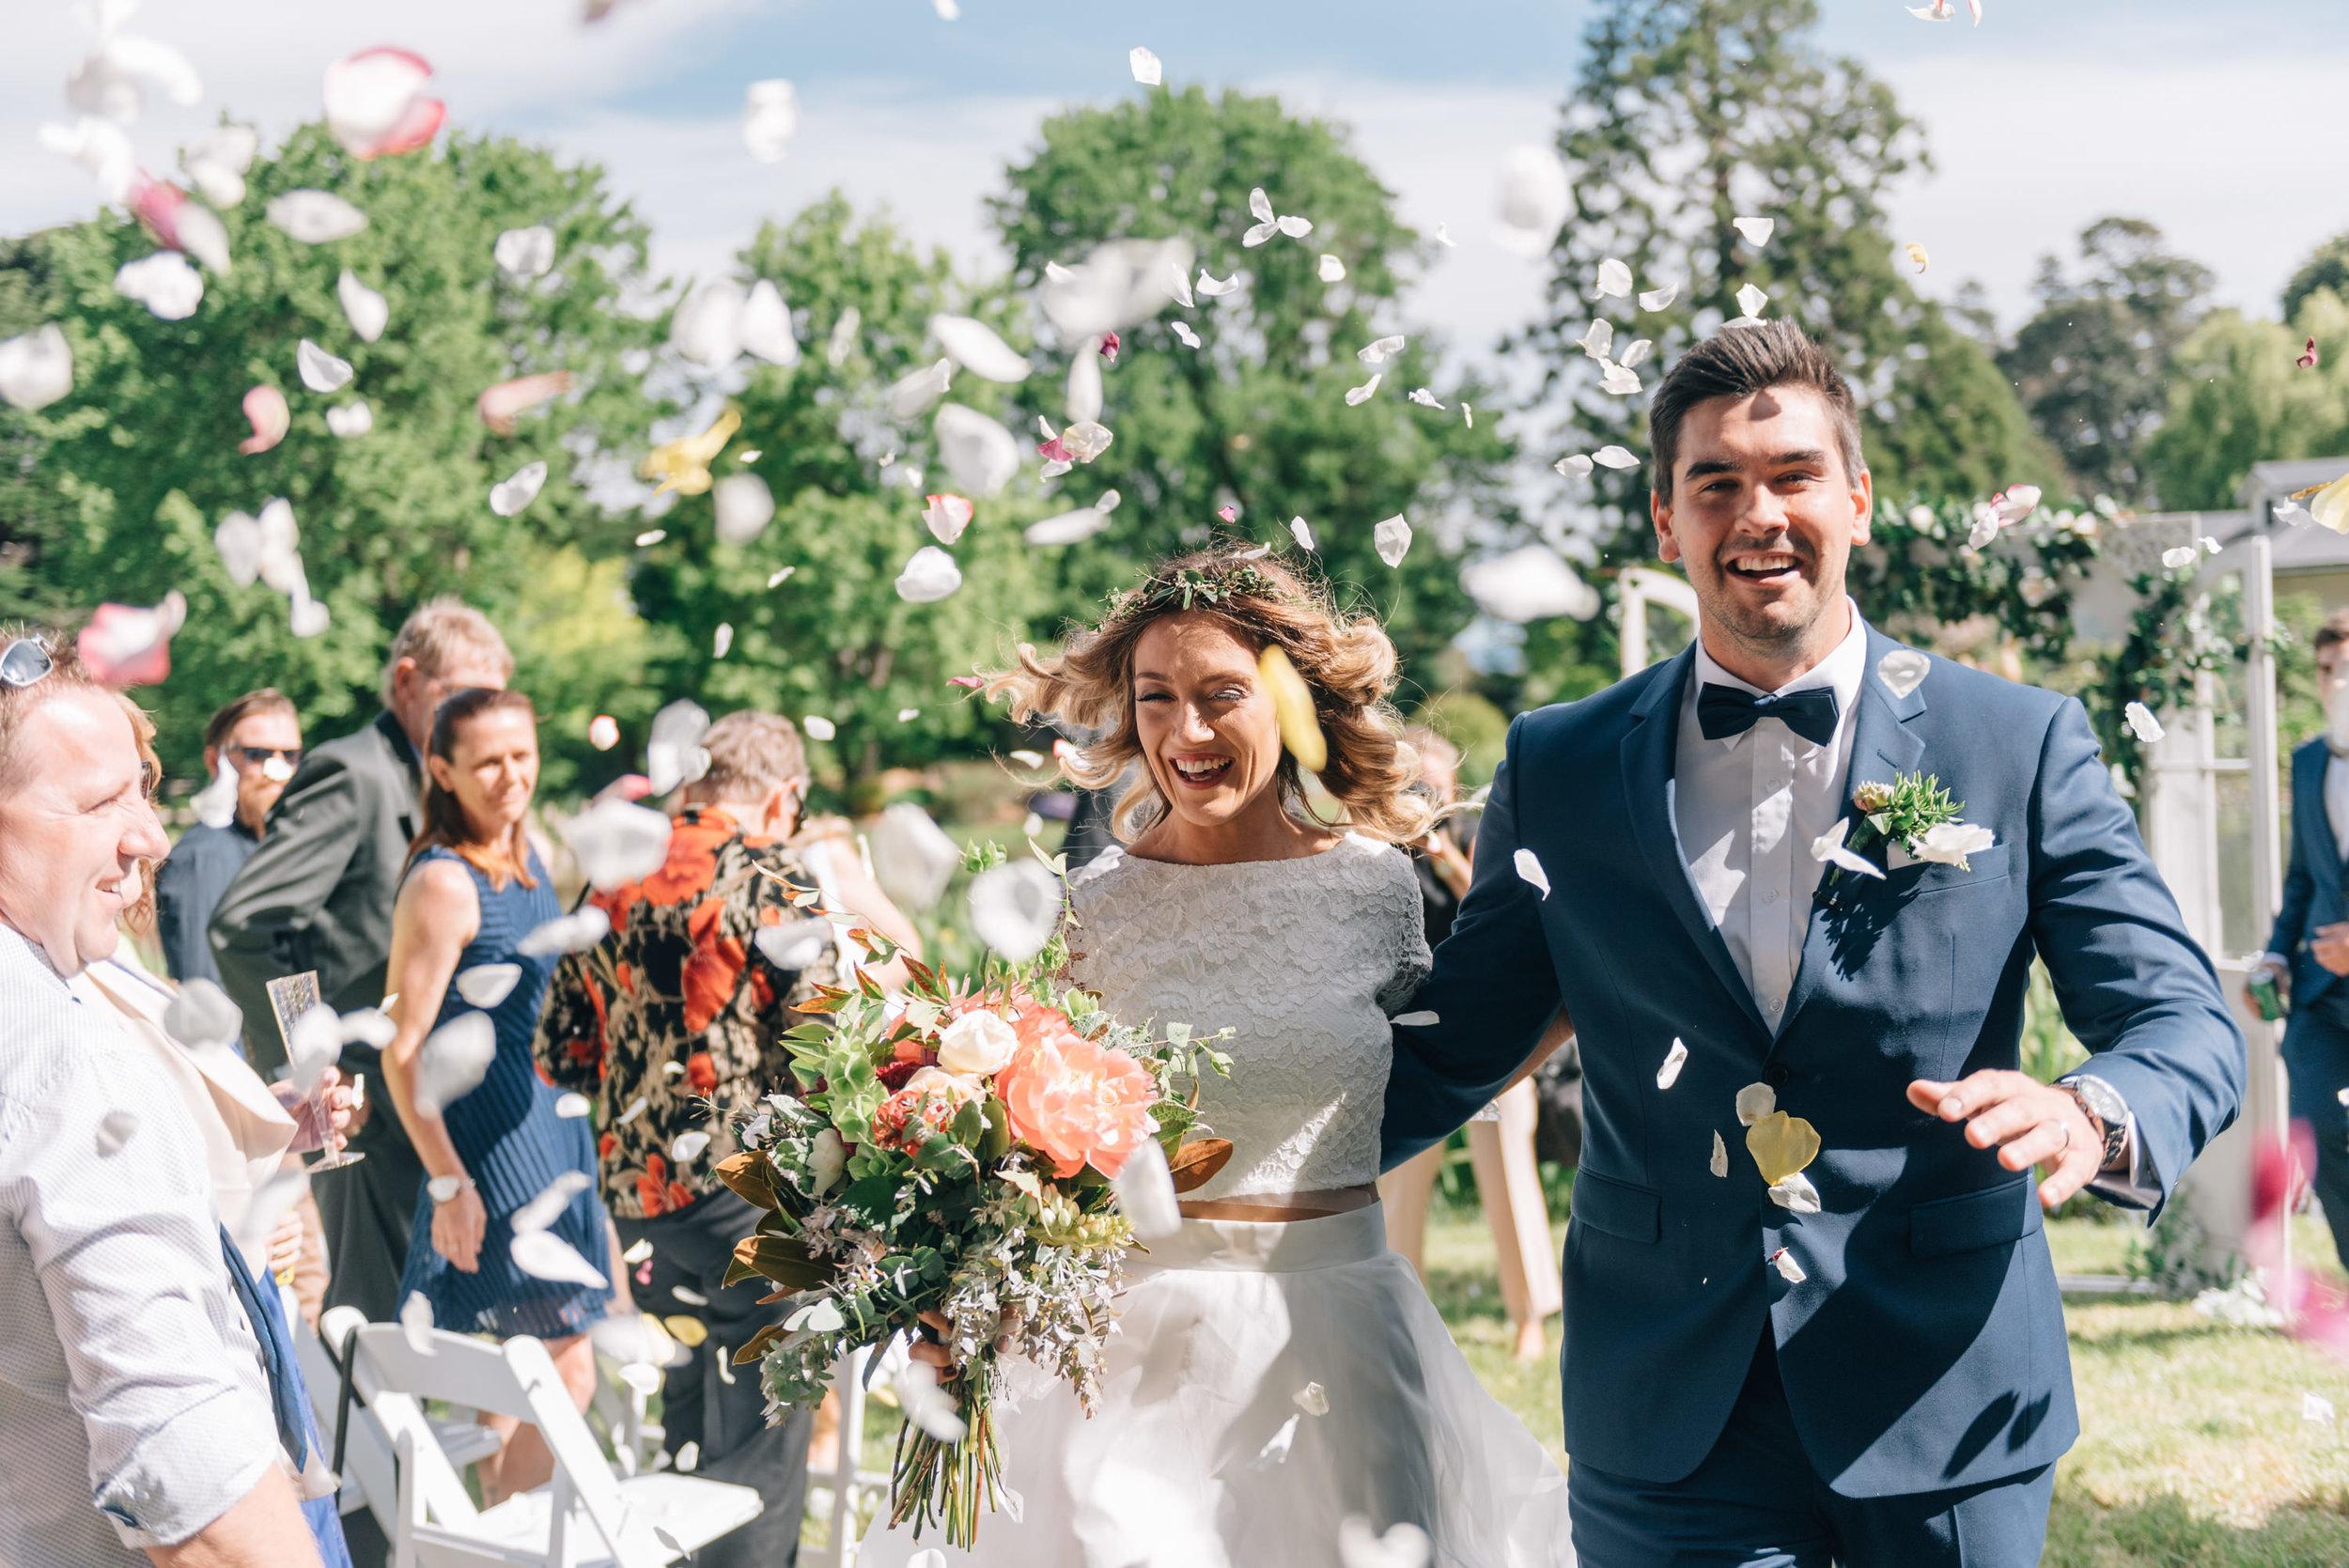 Jenna_Matt_Wedding-47.jpg